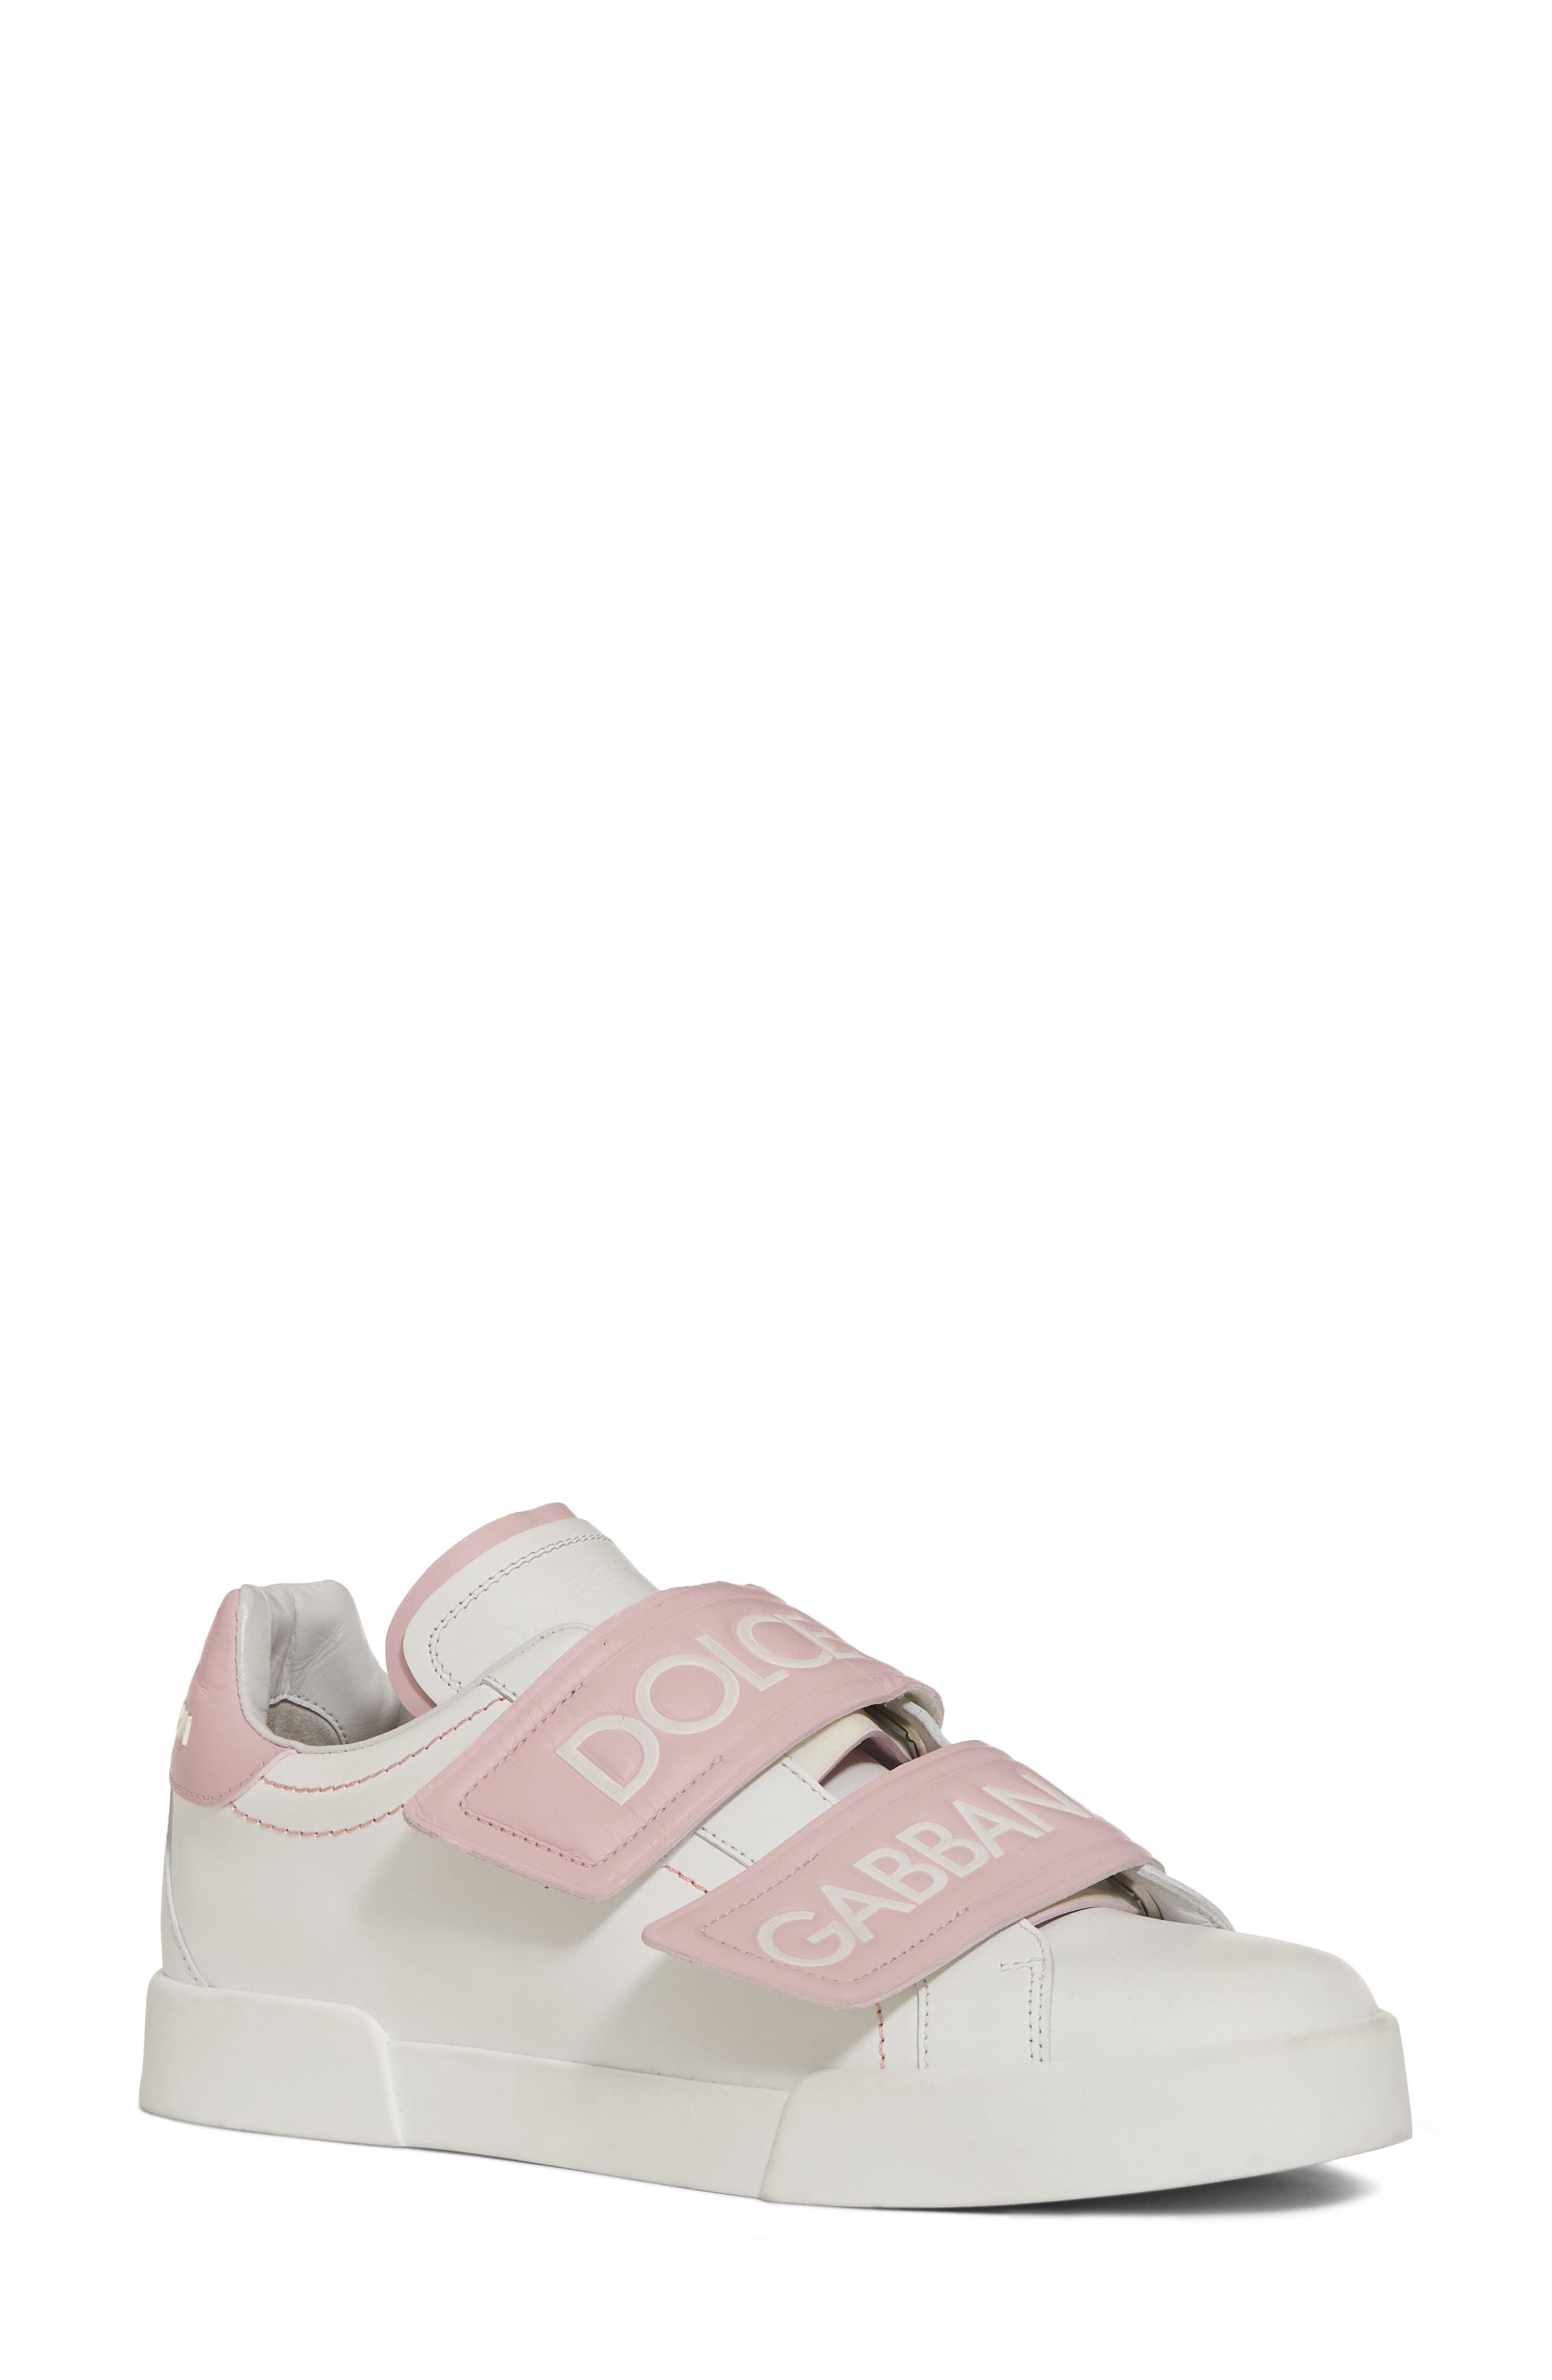 Alternate Image 1 Selected - Dolce&Gabbana Logo Strap Sneaker (Women)